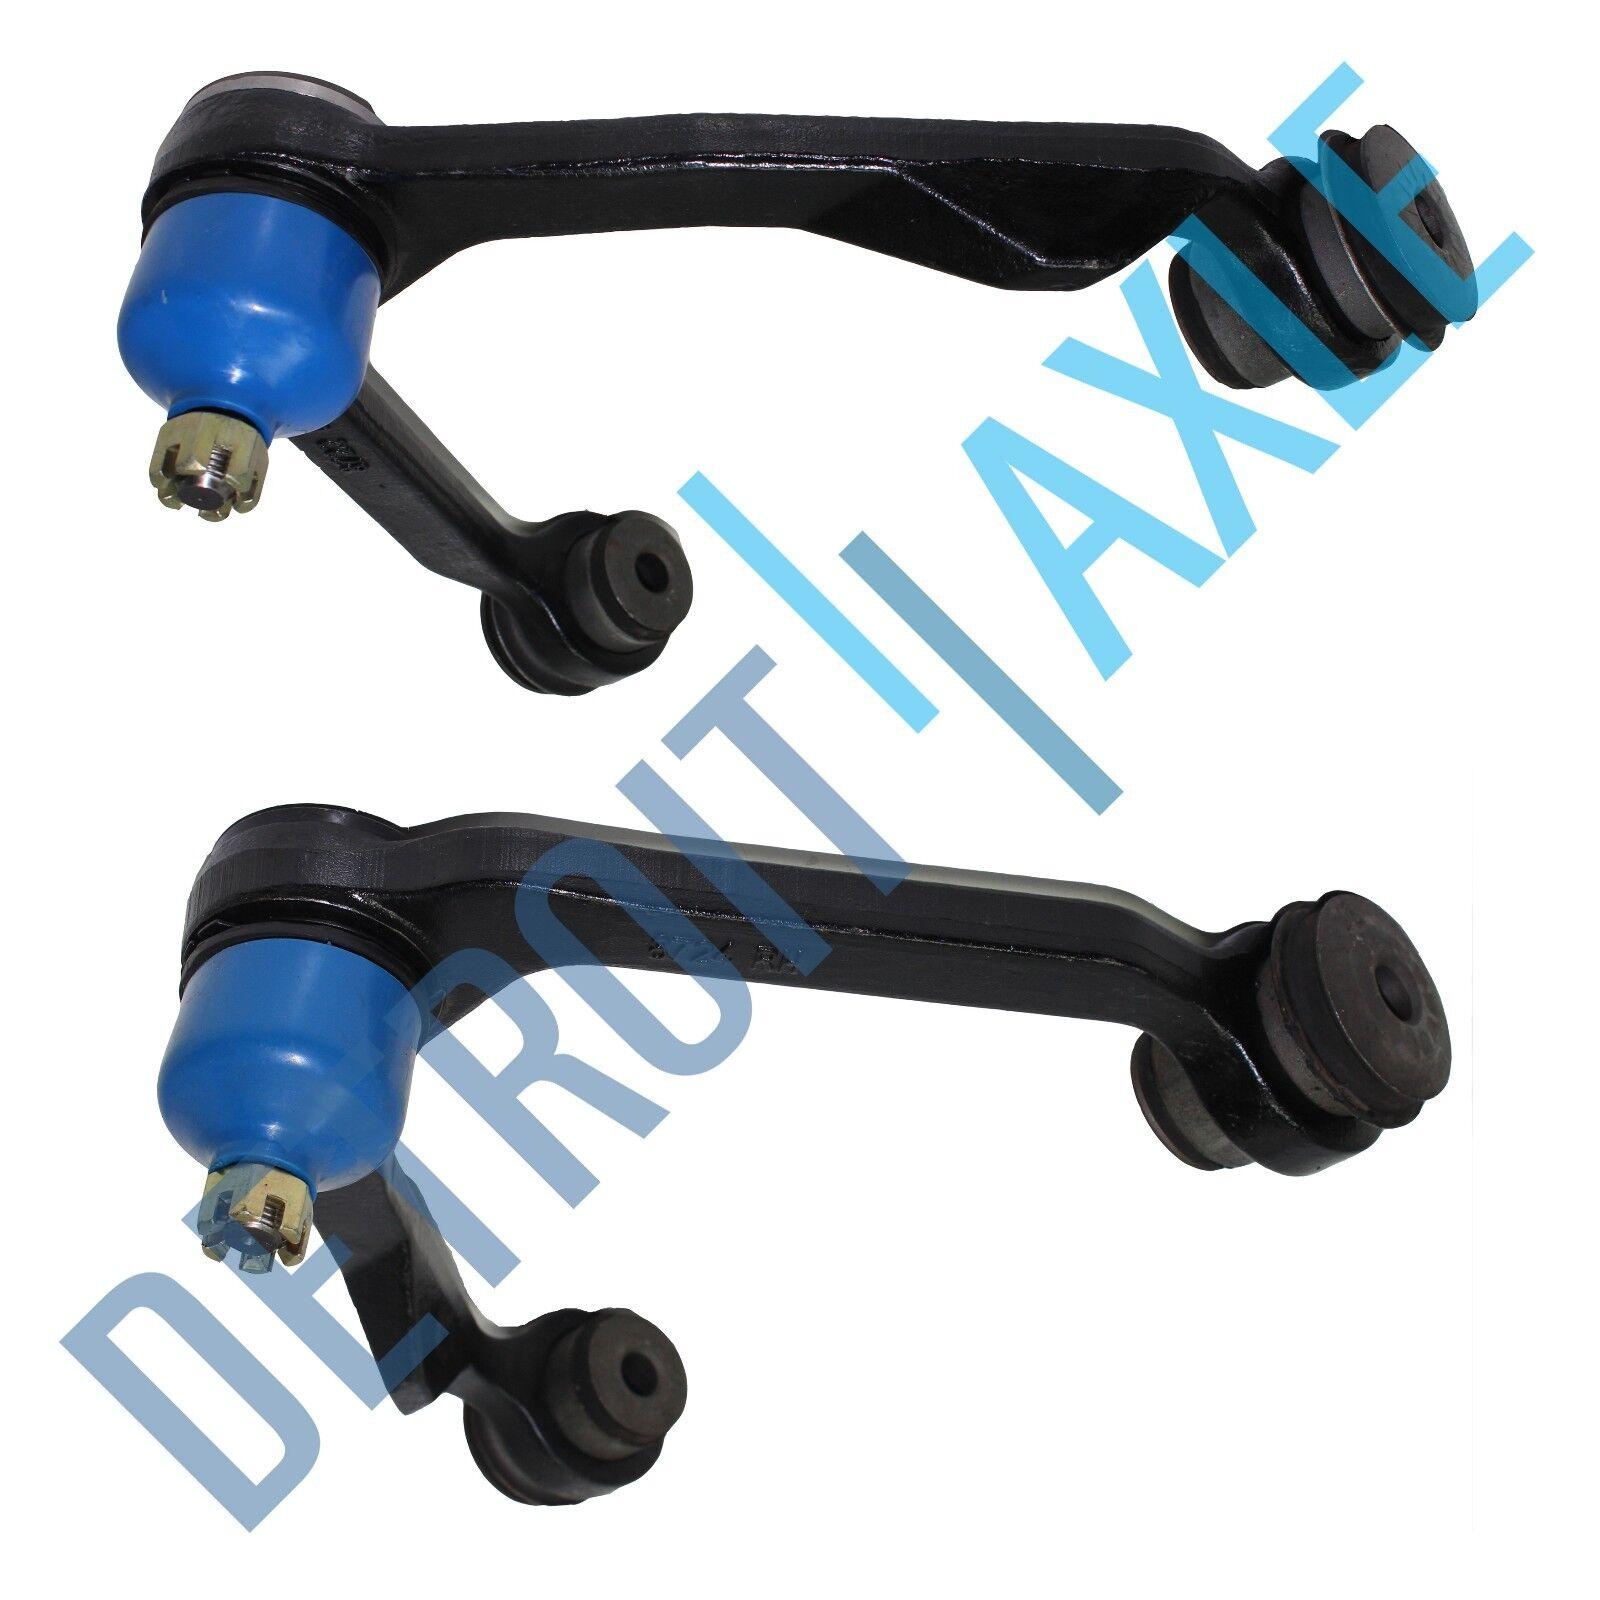 Garland 4519840 Swivel Caster W-Brake N897-3 1